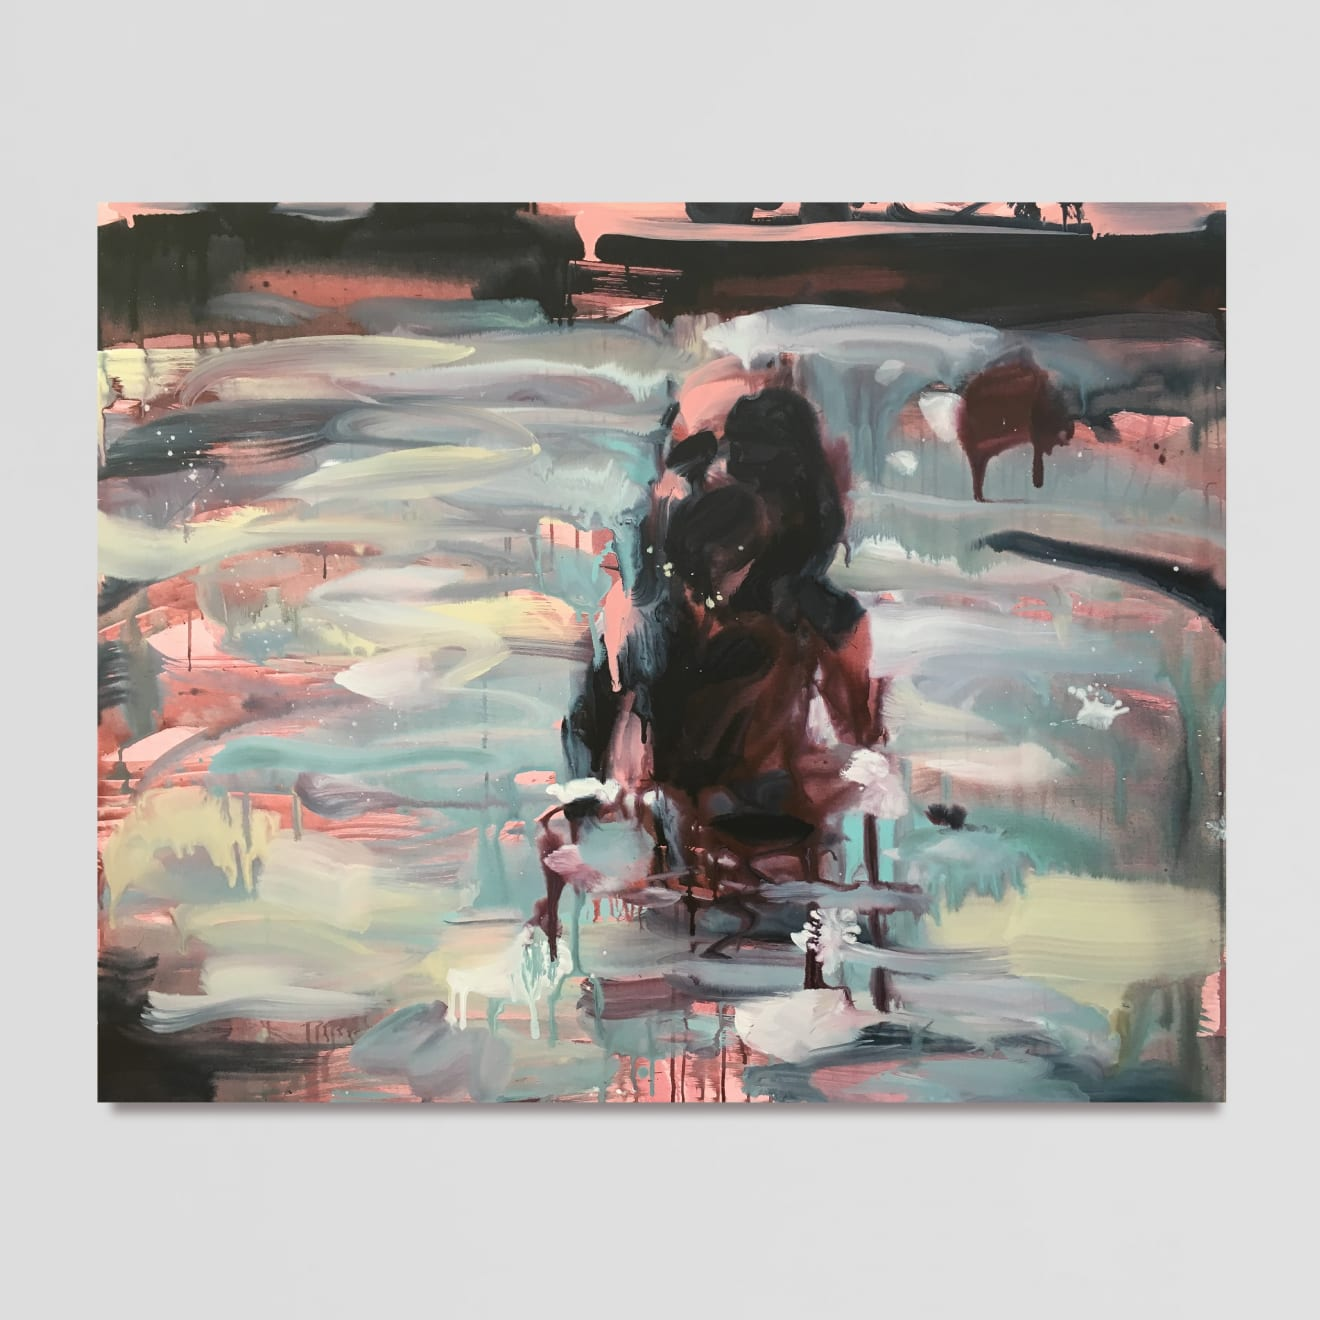 Laura Lancaster Phantom, 2019 Acrylic on canvas 120 x 150 cm 47 1/4 x 59 1/8 in